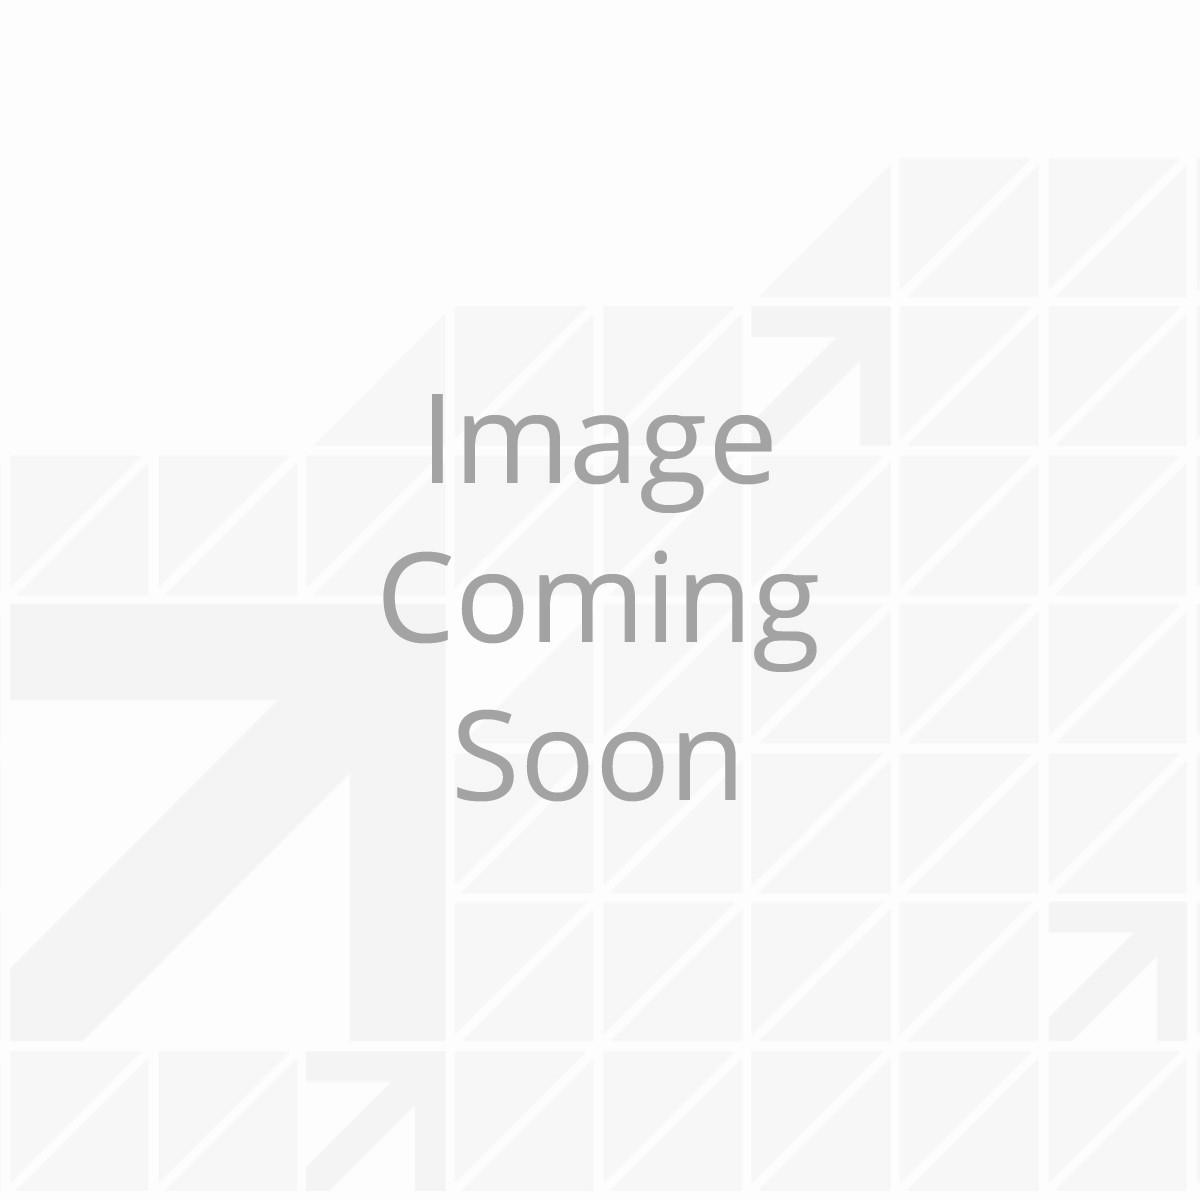 Solid Stance Step Stabilizer Kit